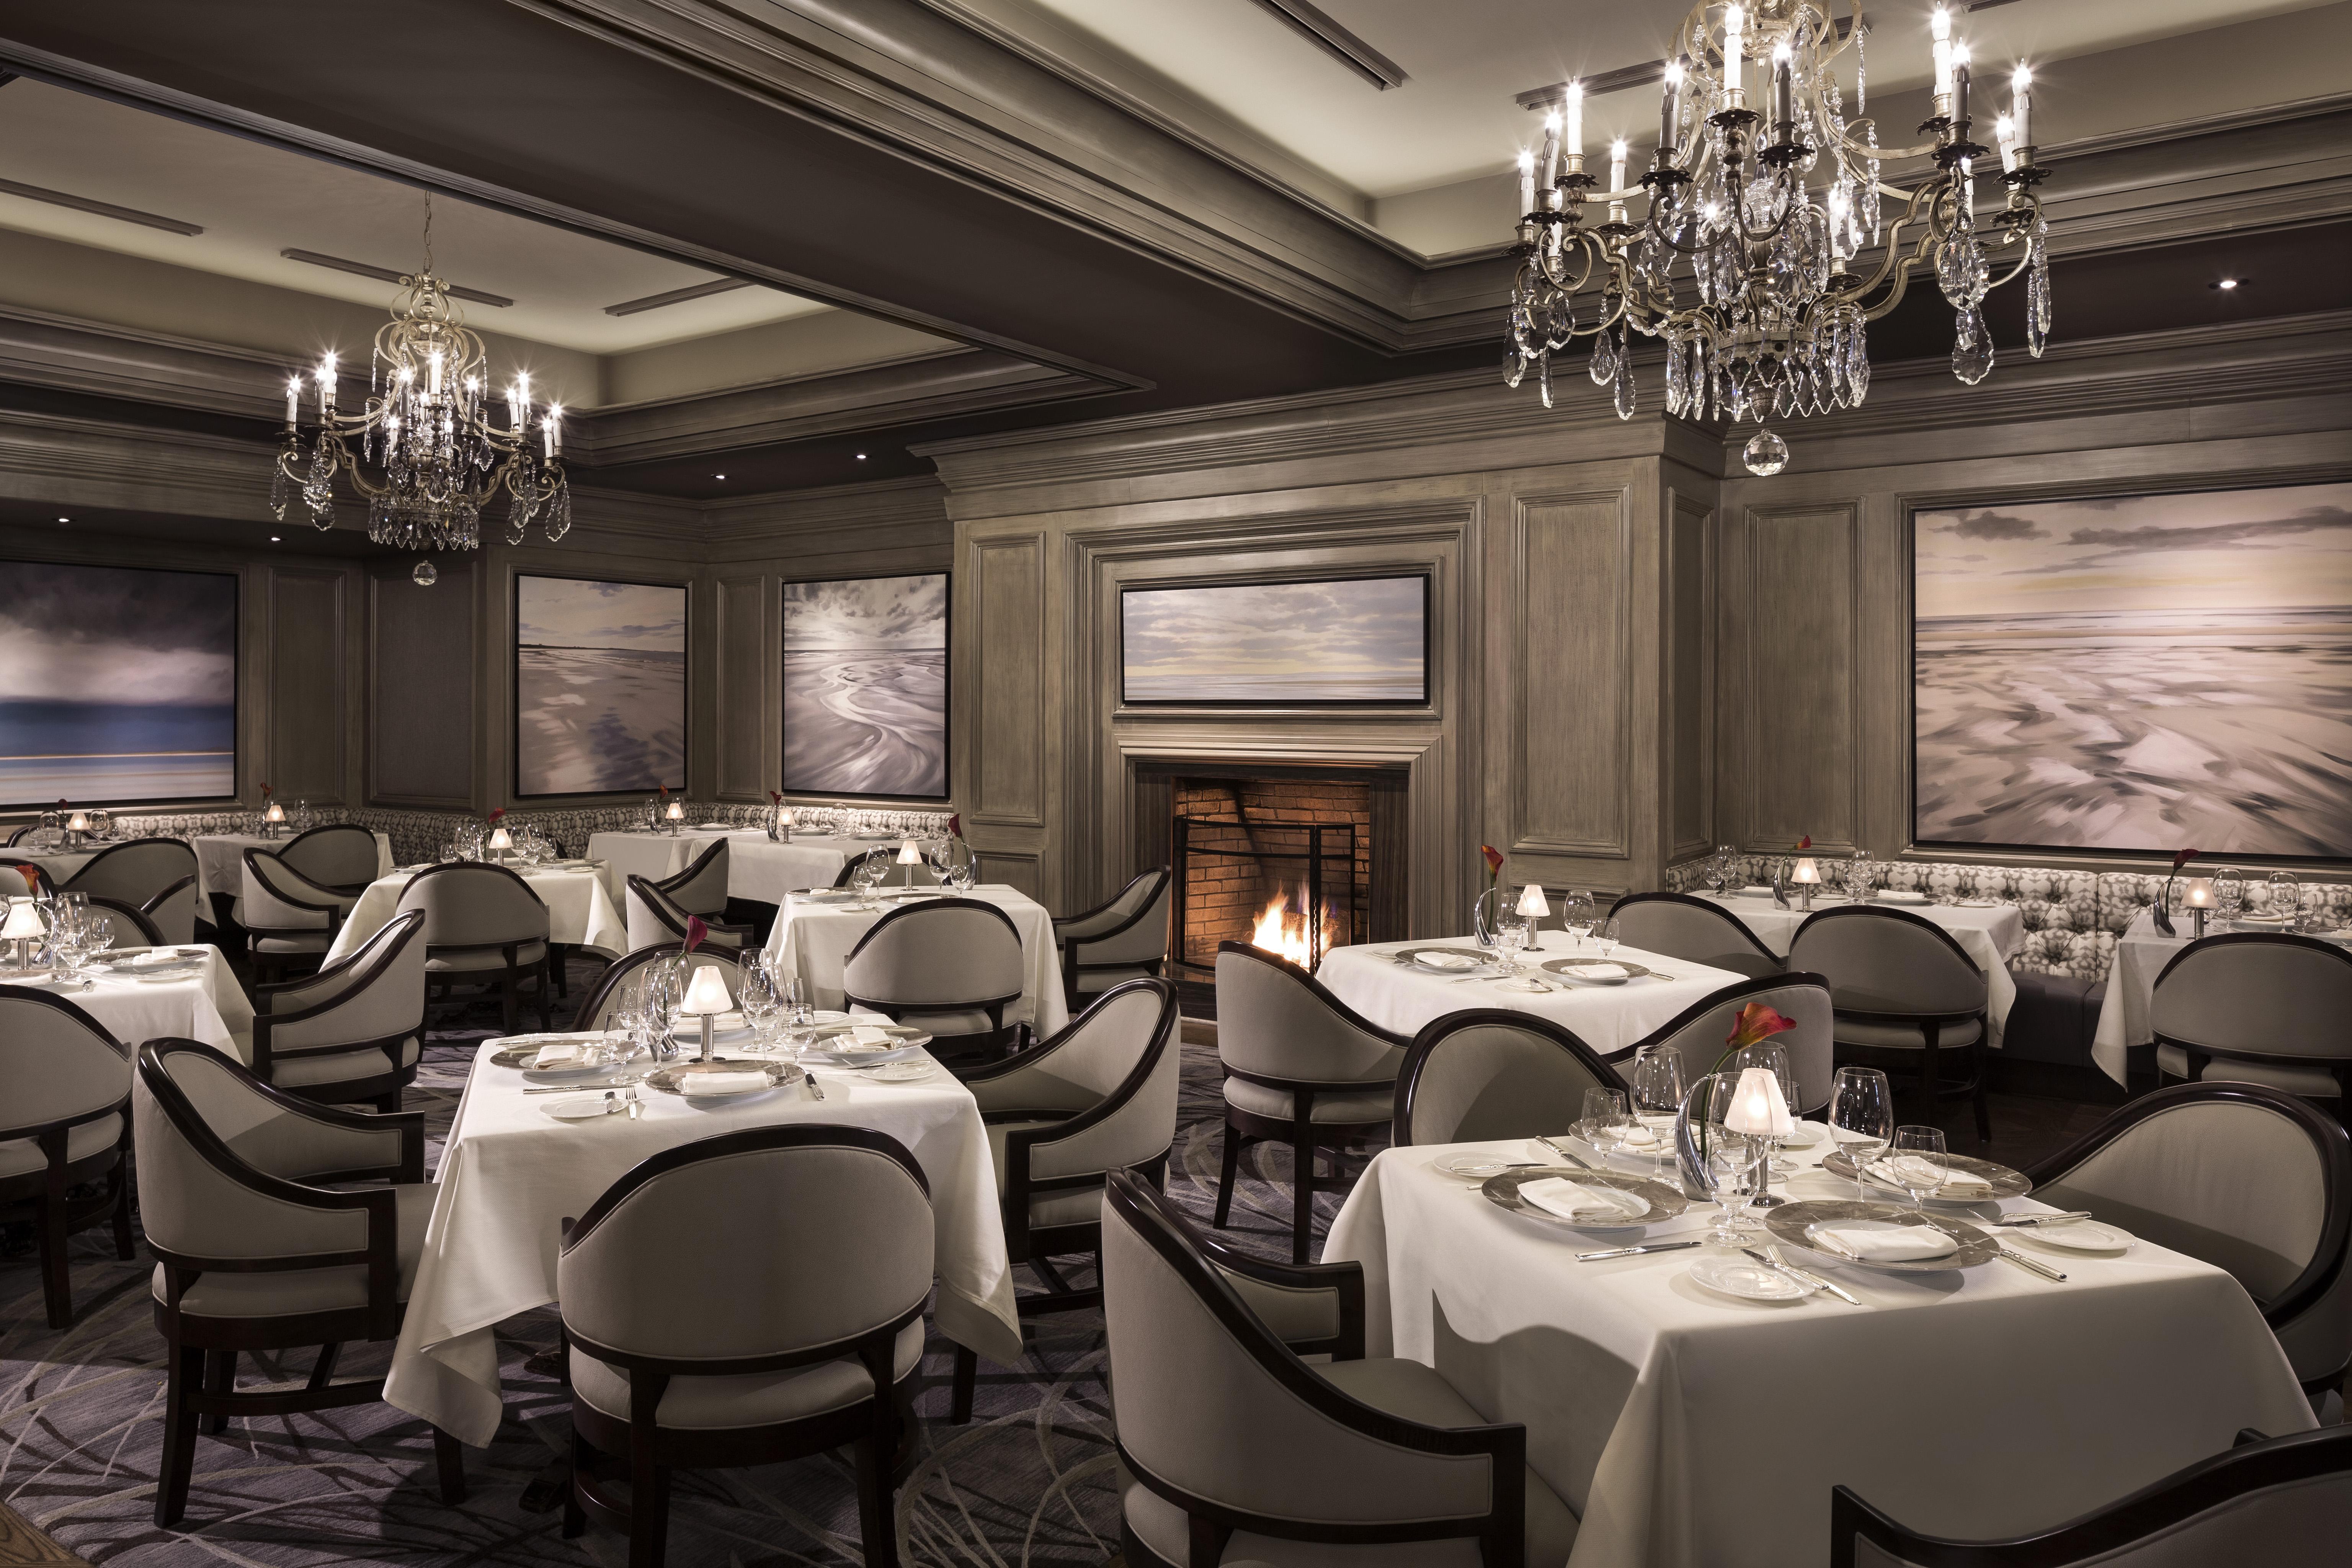 Carlton Restaurants Italian